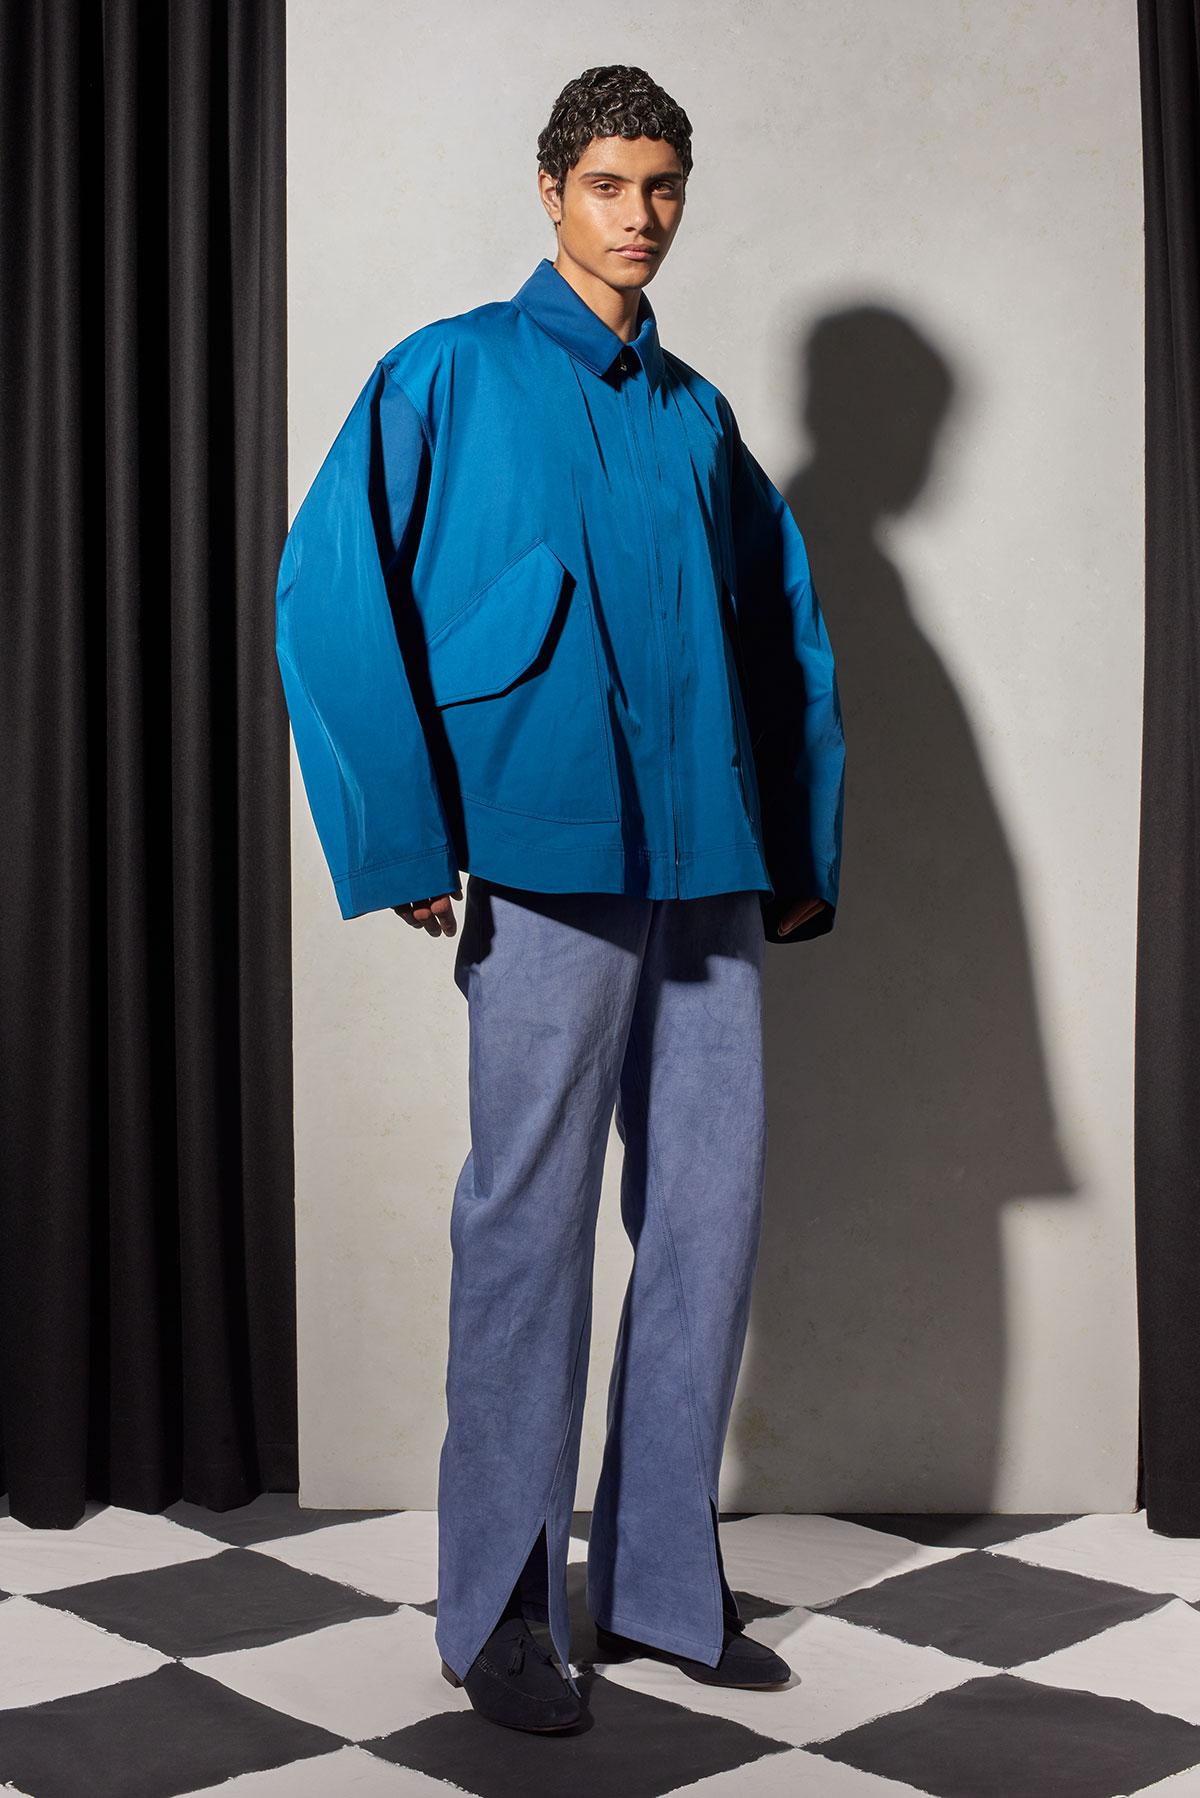 bianca-saunders-fall-winter-2020-menswear